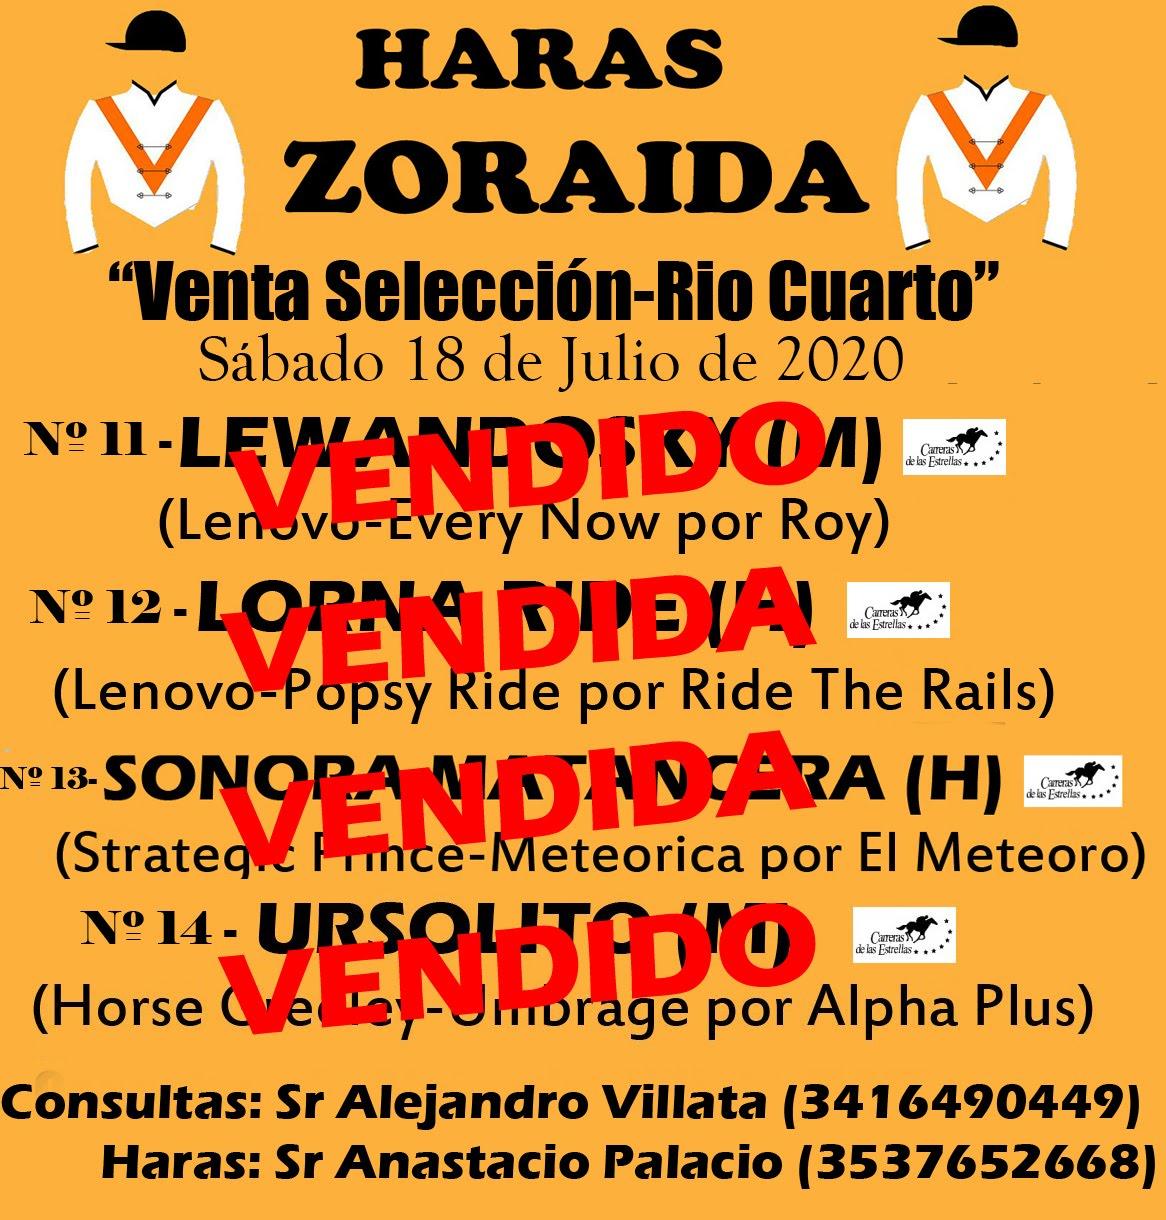 HS ZORAIDA - PRODUCTOS